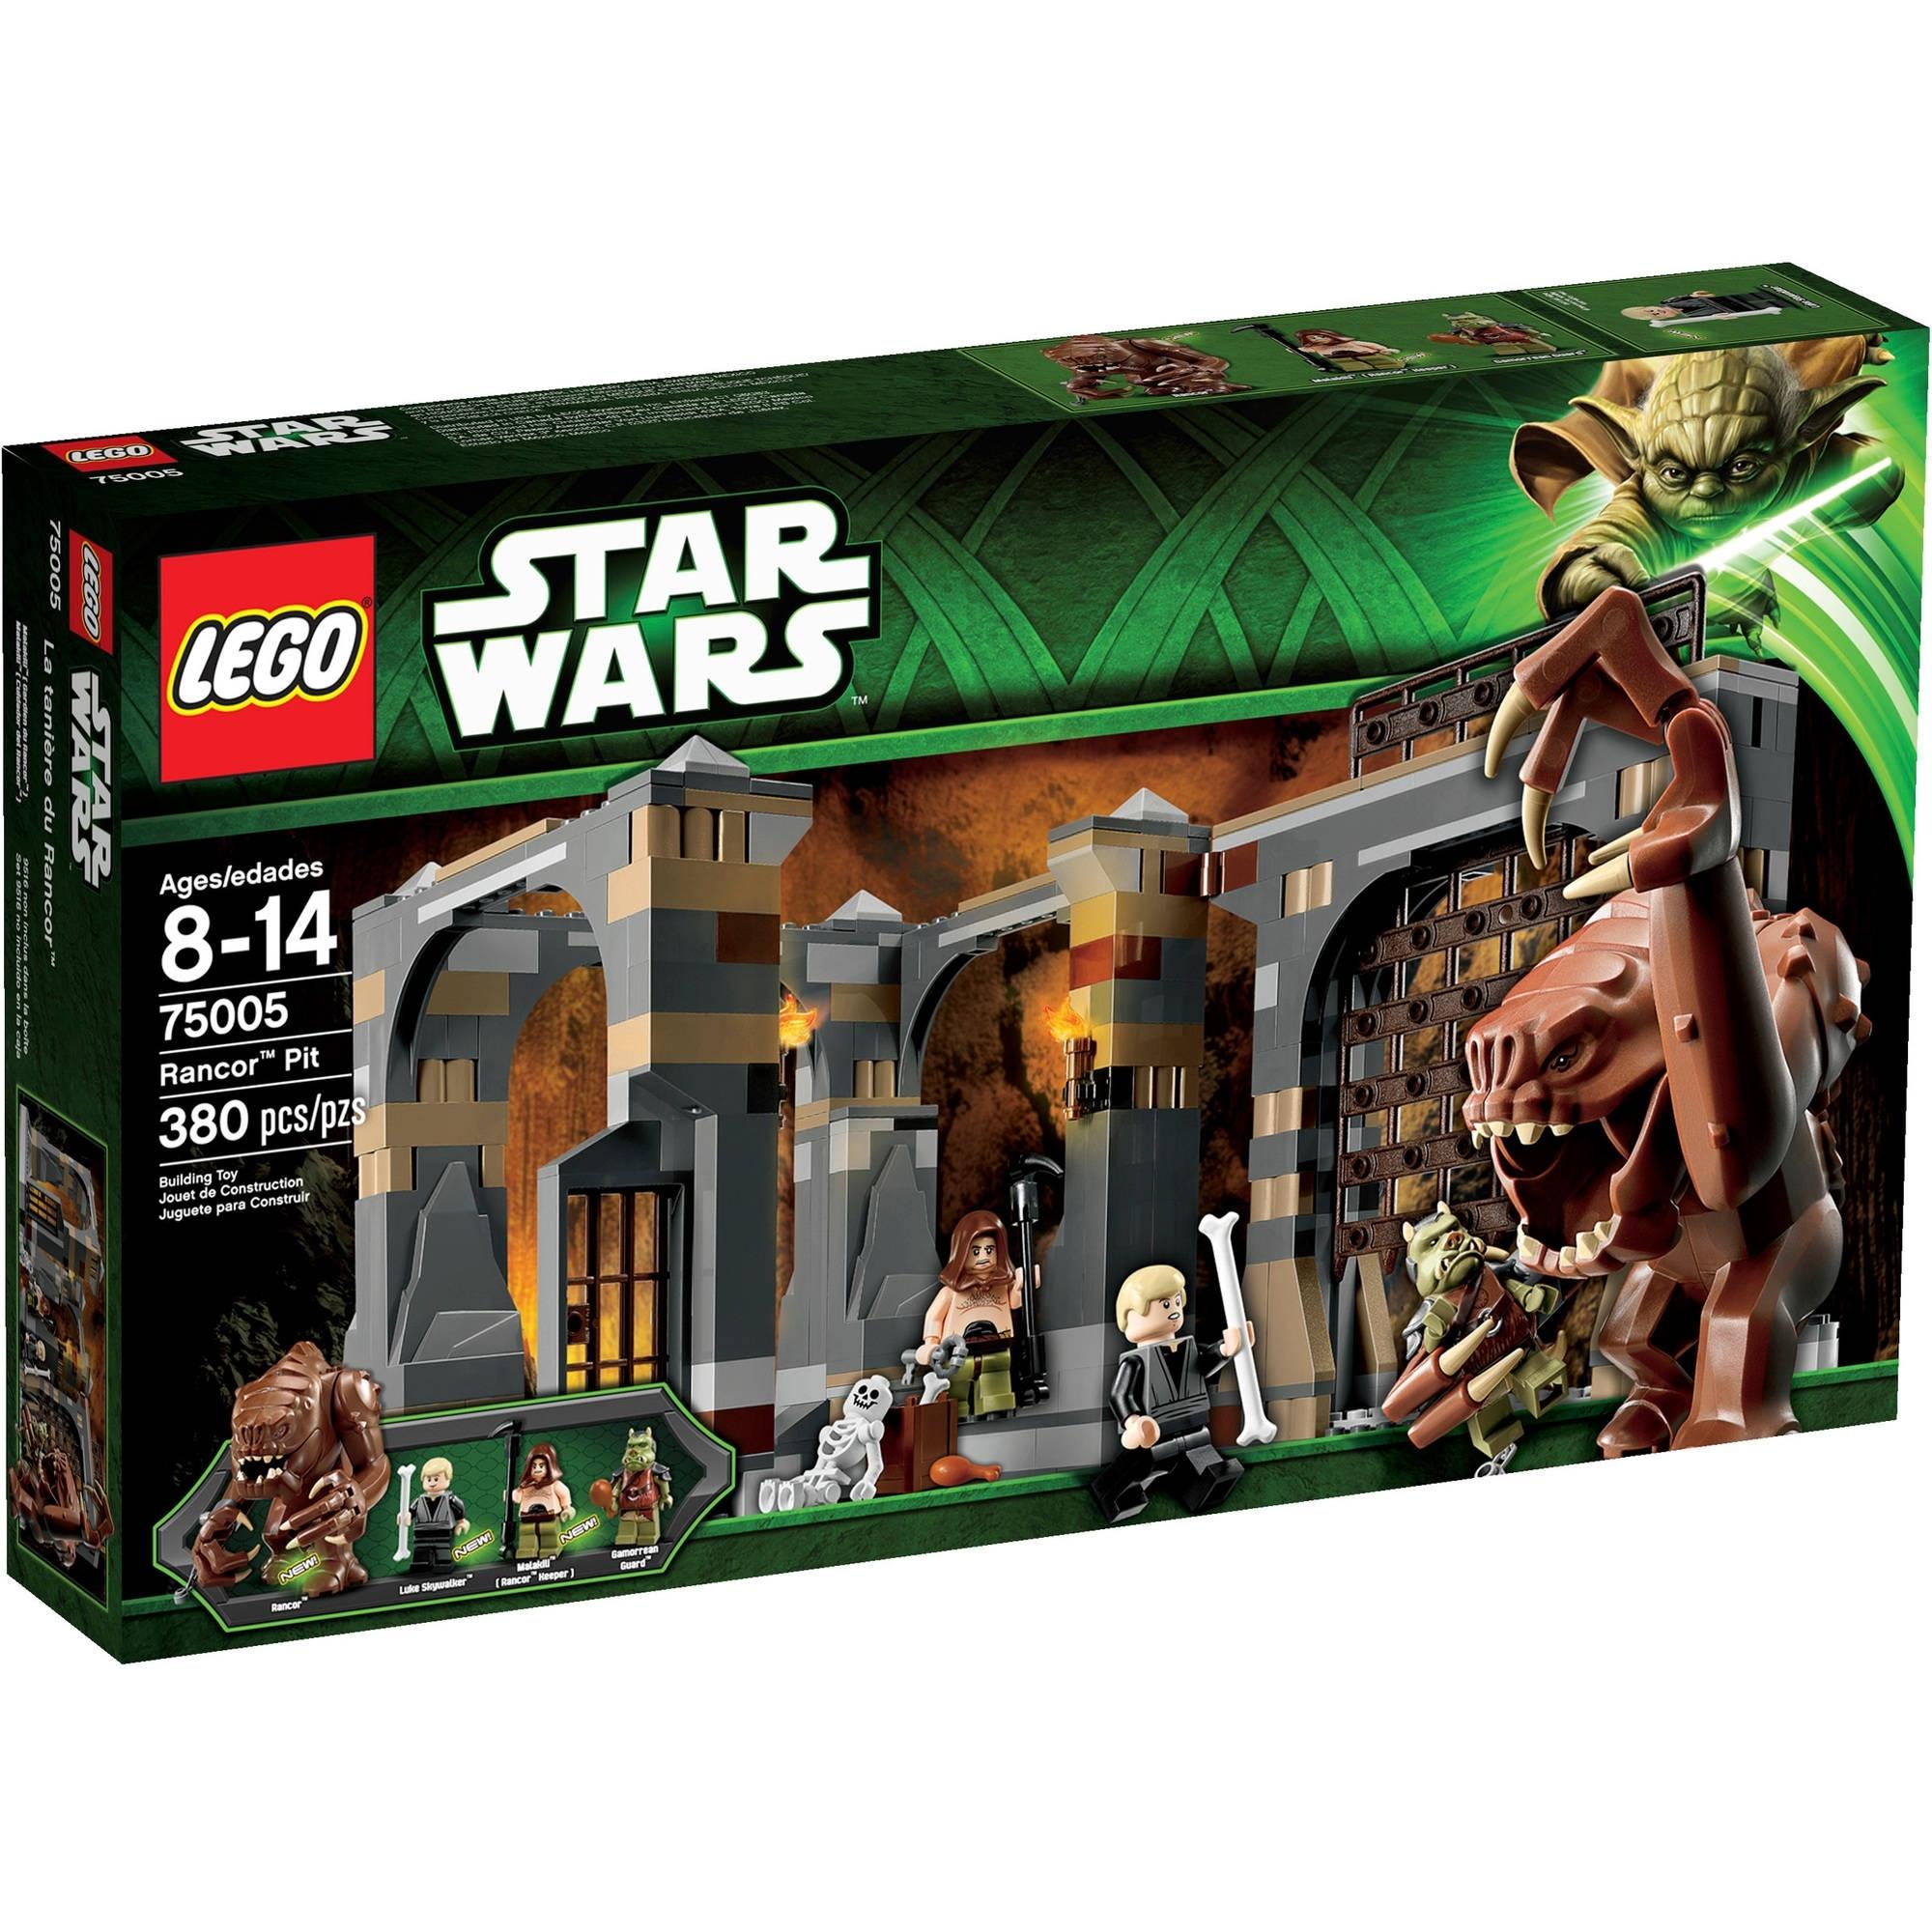 Lego Star Wars Rancor Pit Play Set - Walmart regarding Star Wars Lego Sets Code